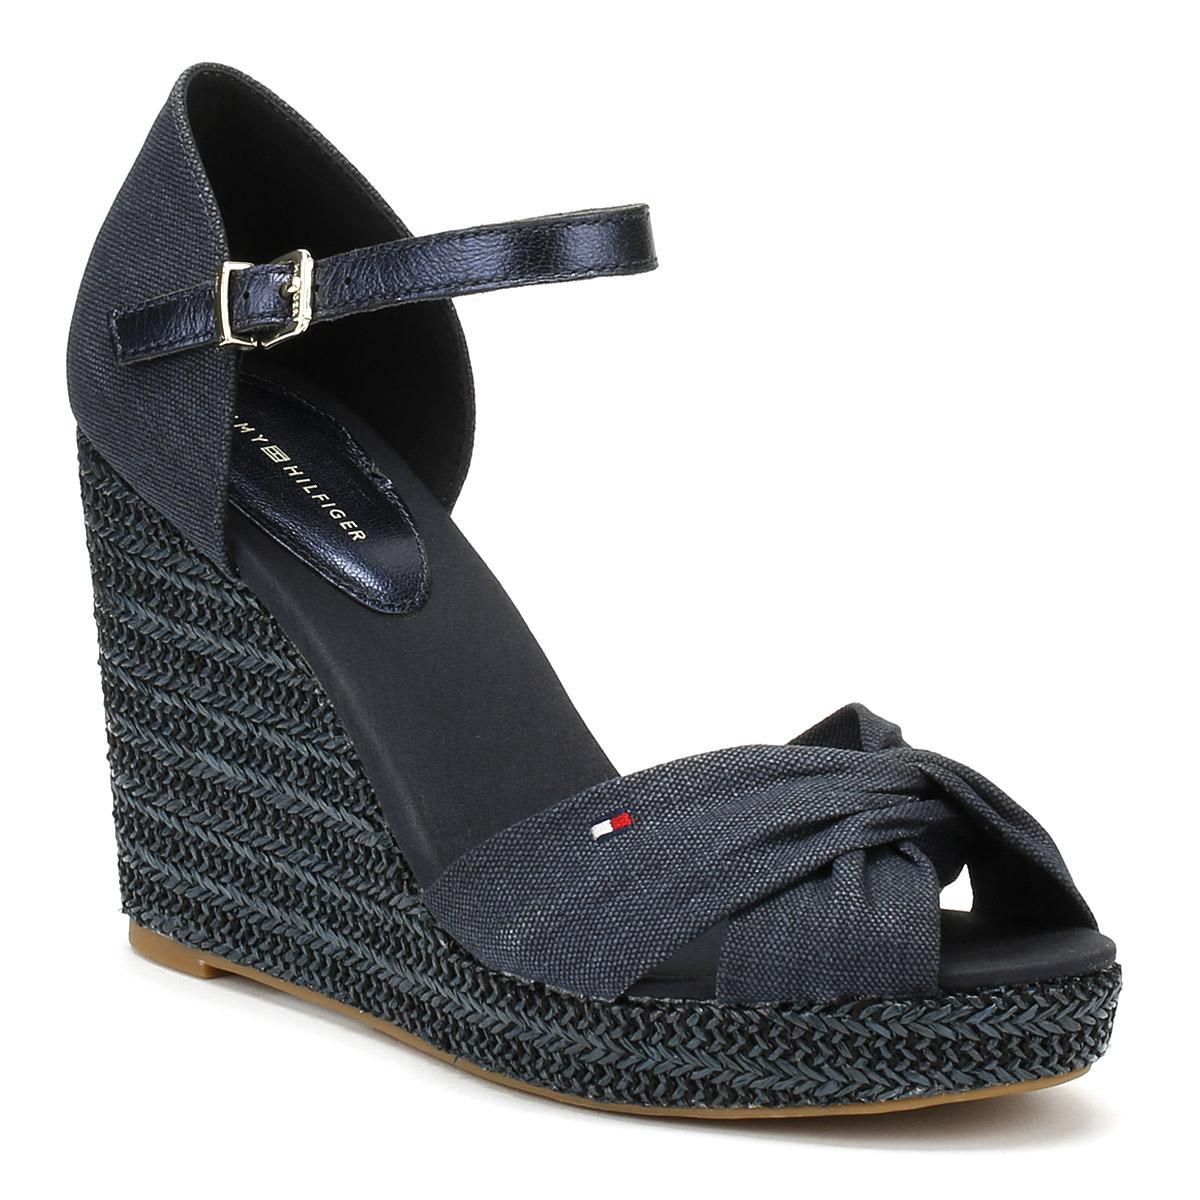 9ecc2283f47 Tommy Hilfiger Womens Midnight Navy Metallic Elena Wedge Sandals in ...